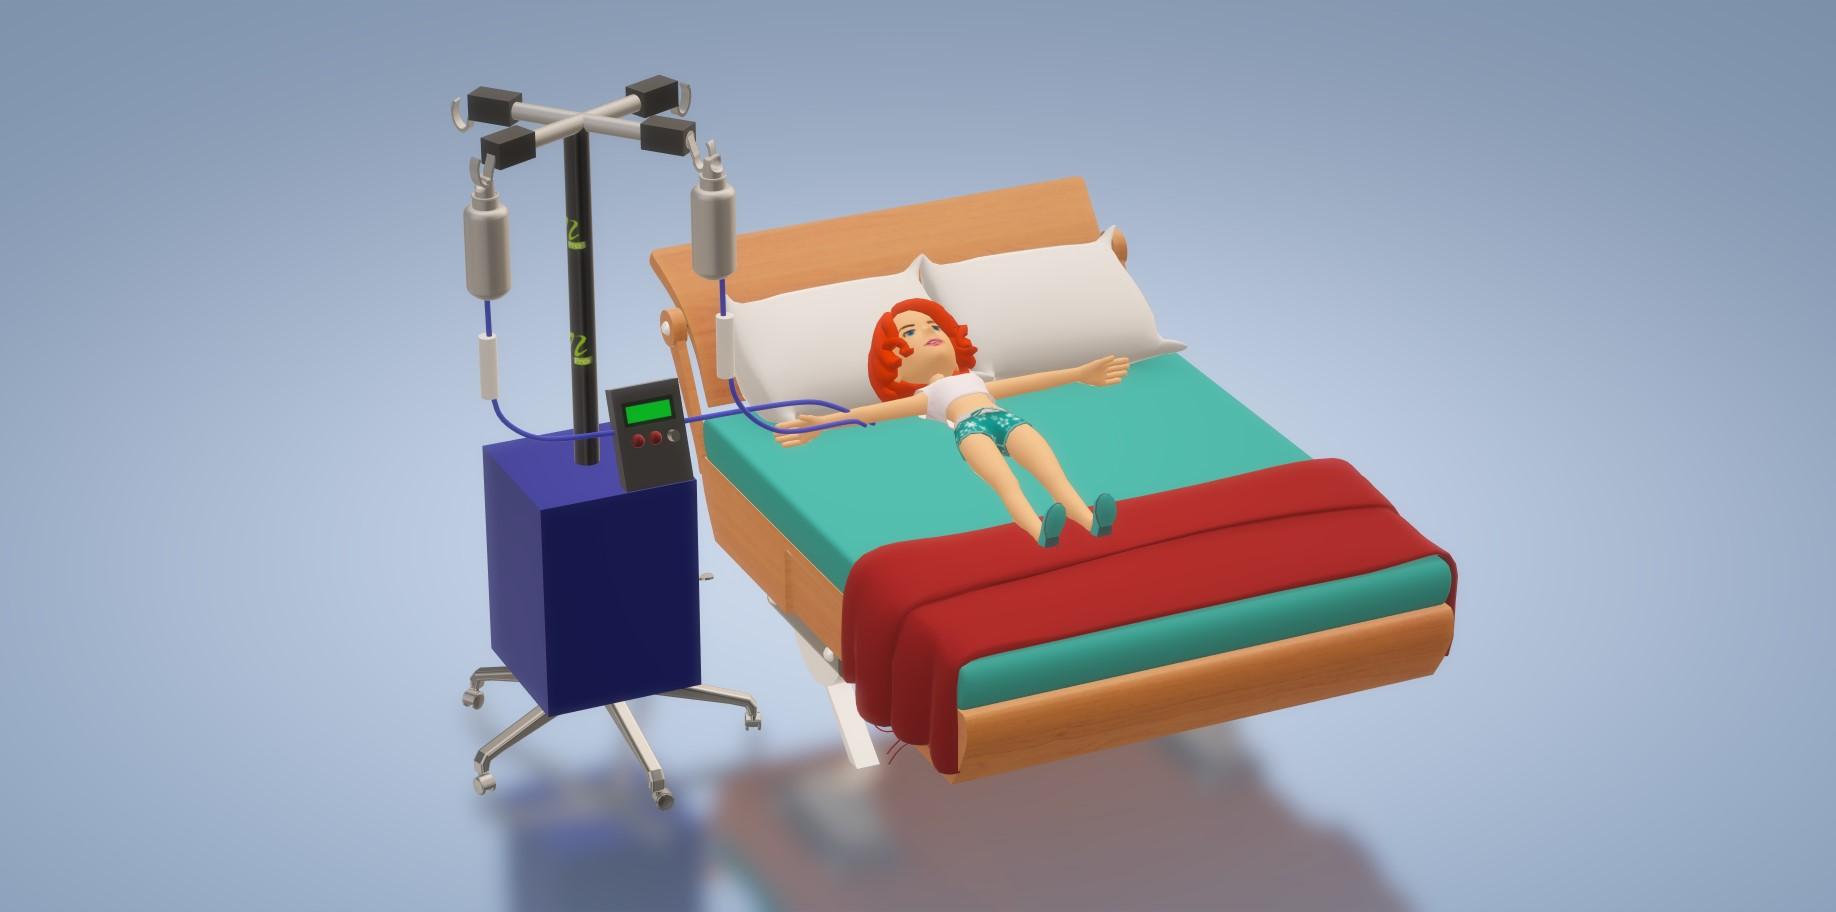 nevon automatic IV pole with IV bag